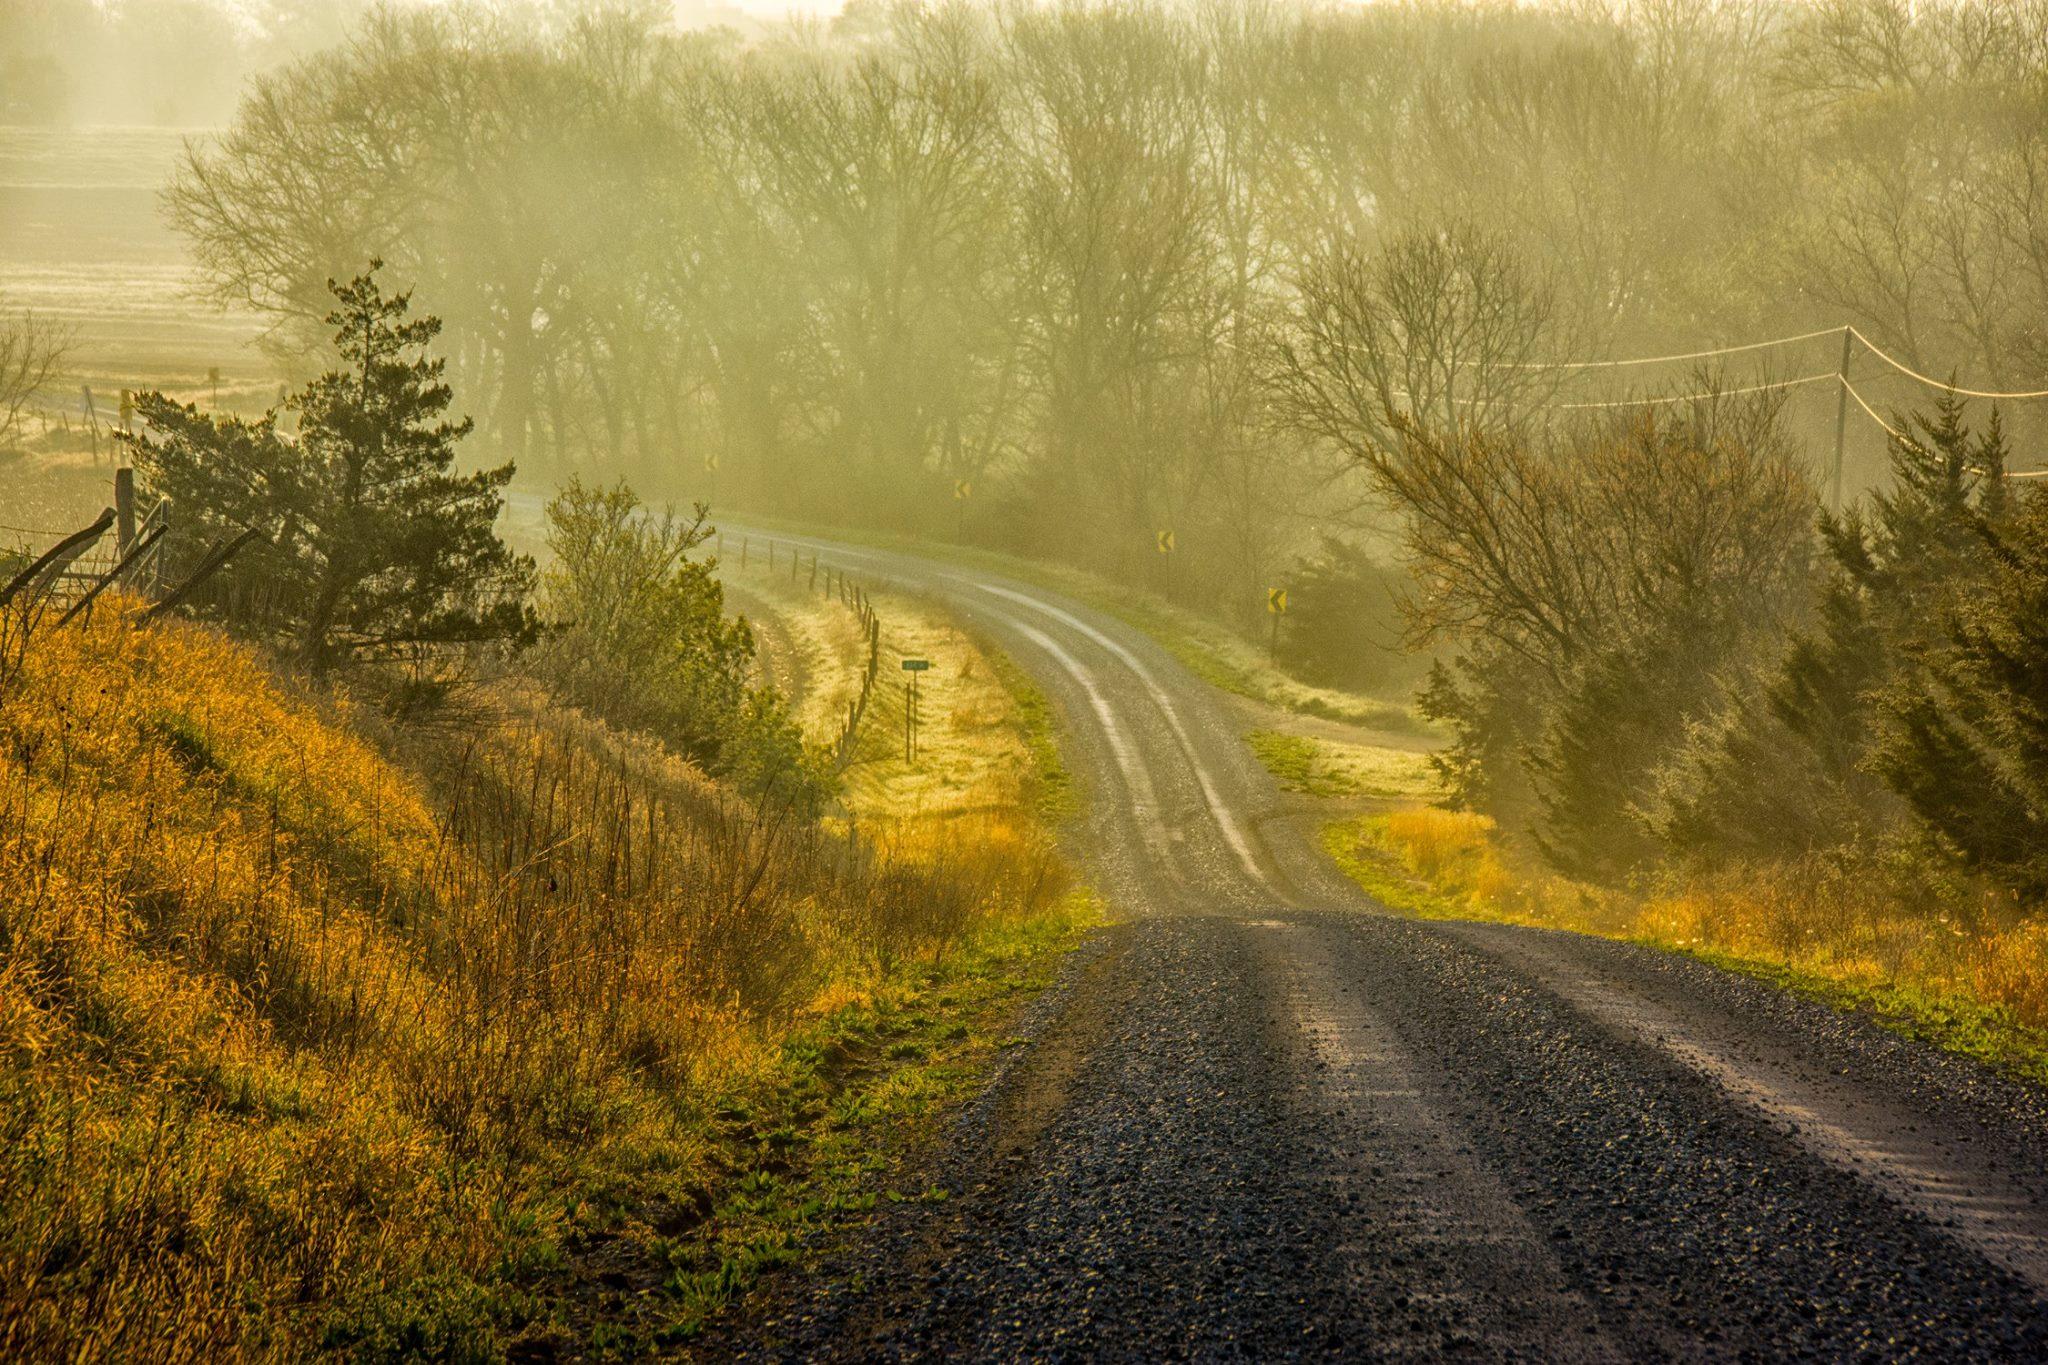 17 Photos That Show How Beautiful Nebraska Can Look